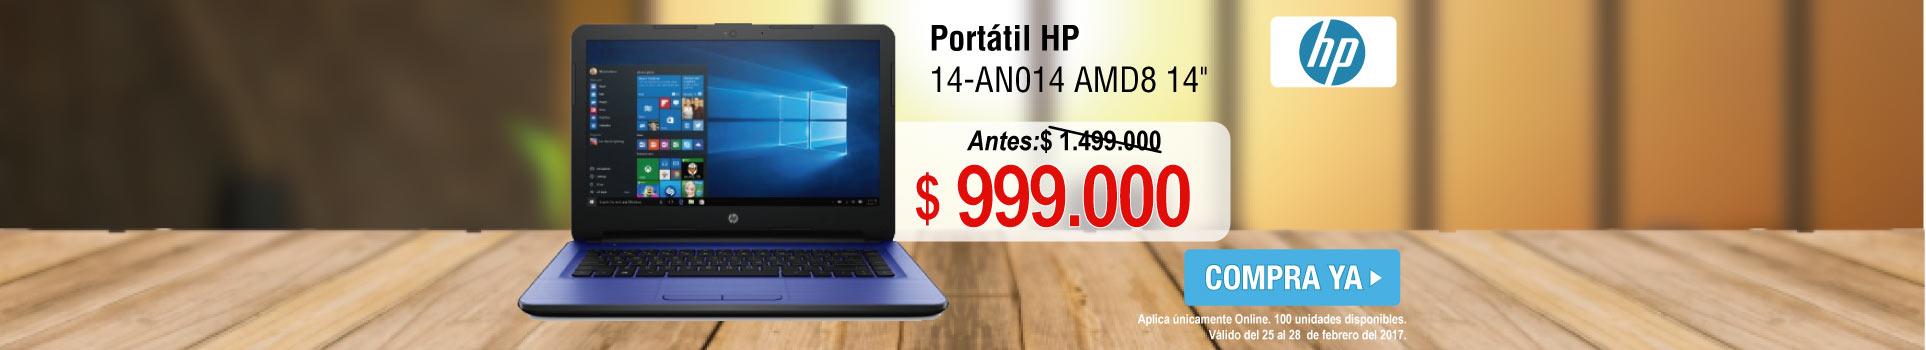 Portátil HP 14-AN014 AMD8 14 azul - banner principal